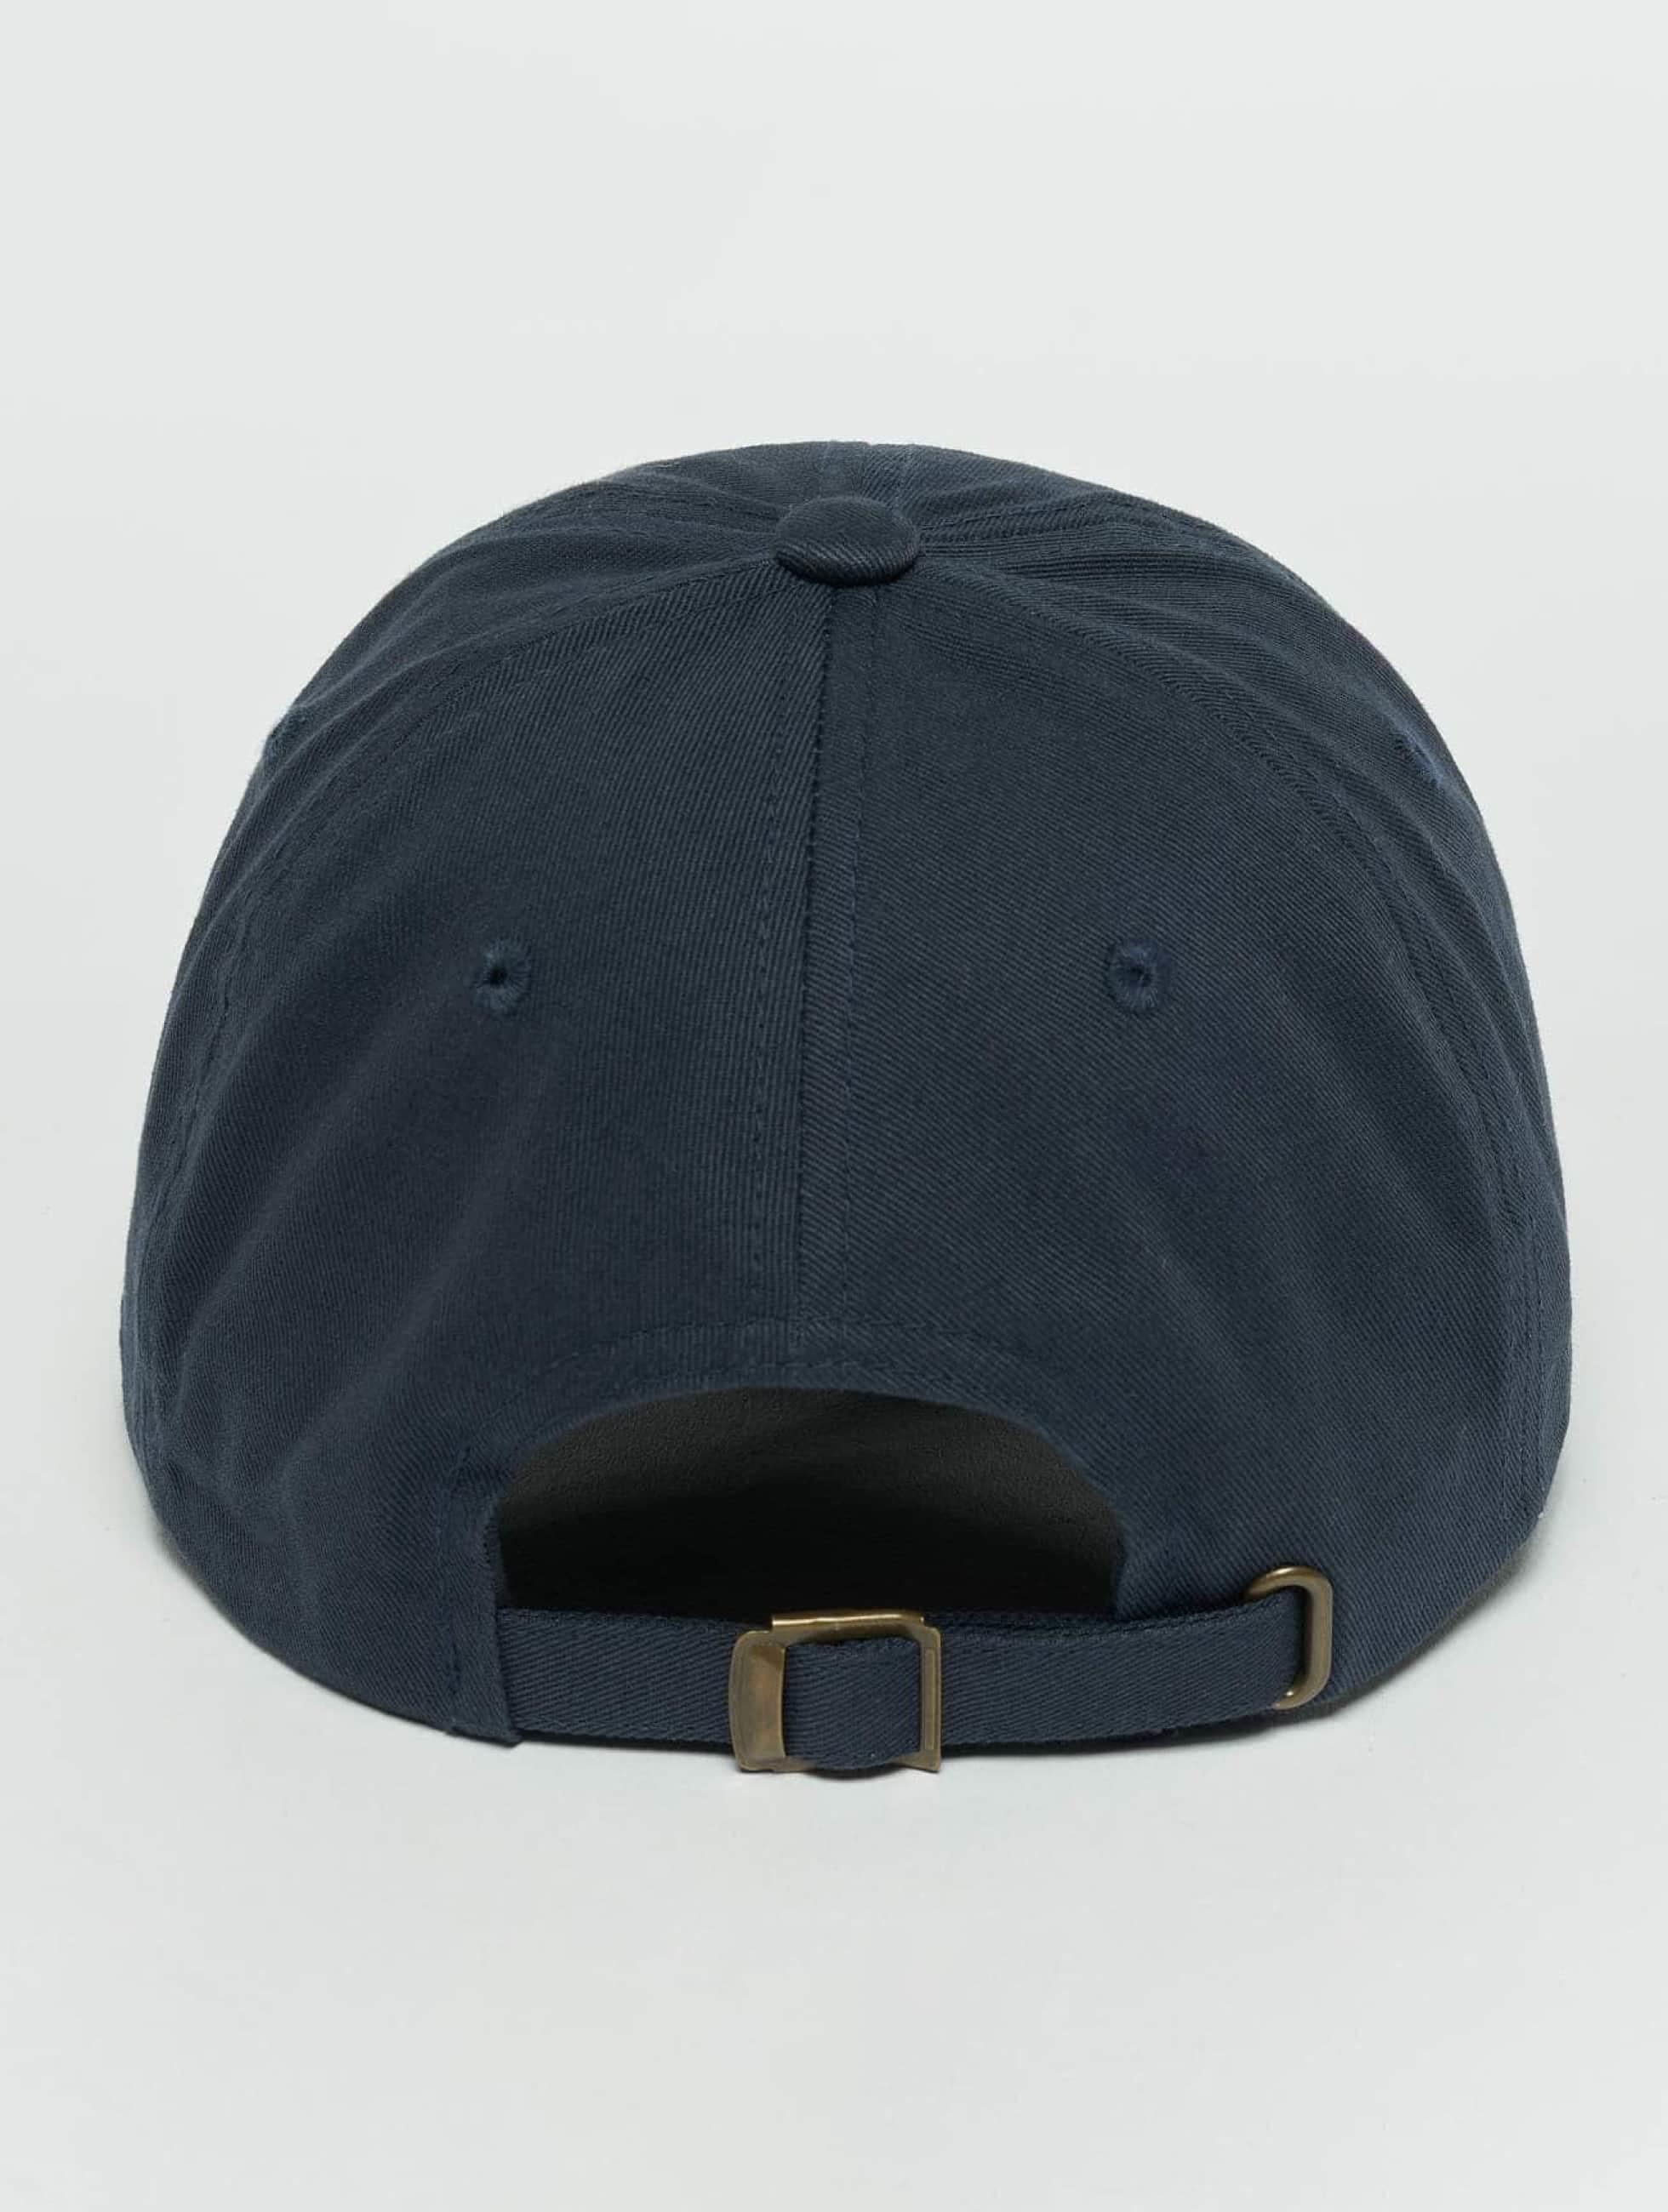 TurnUP Snapback Caps Never niebieski